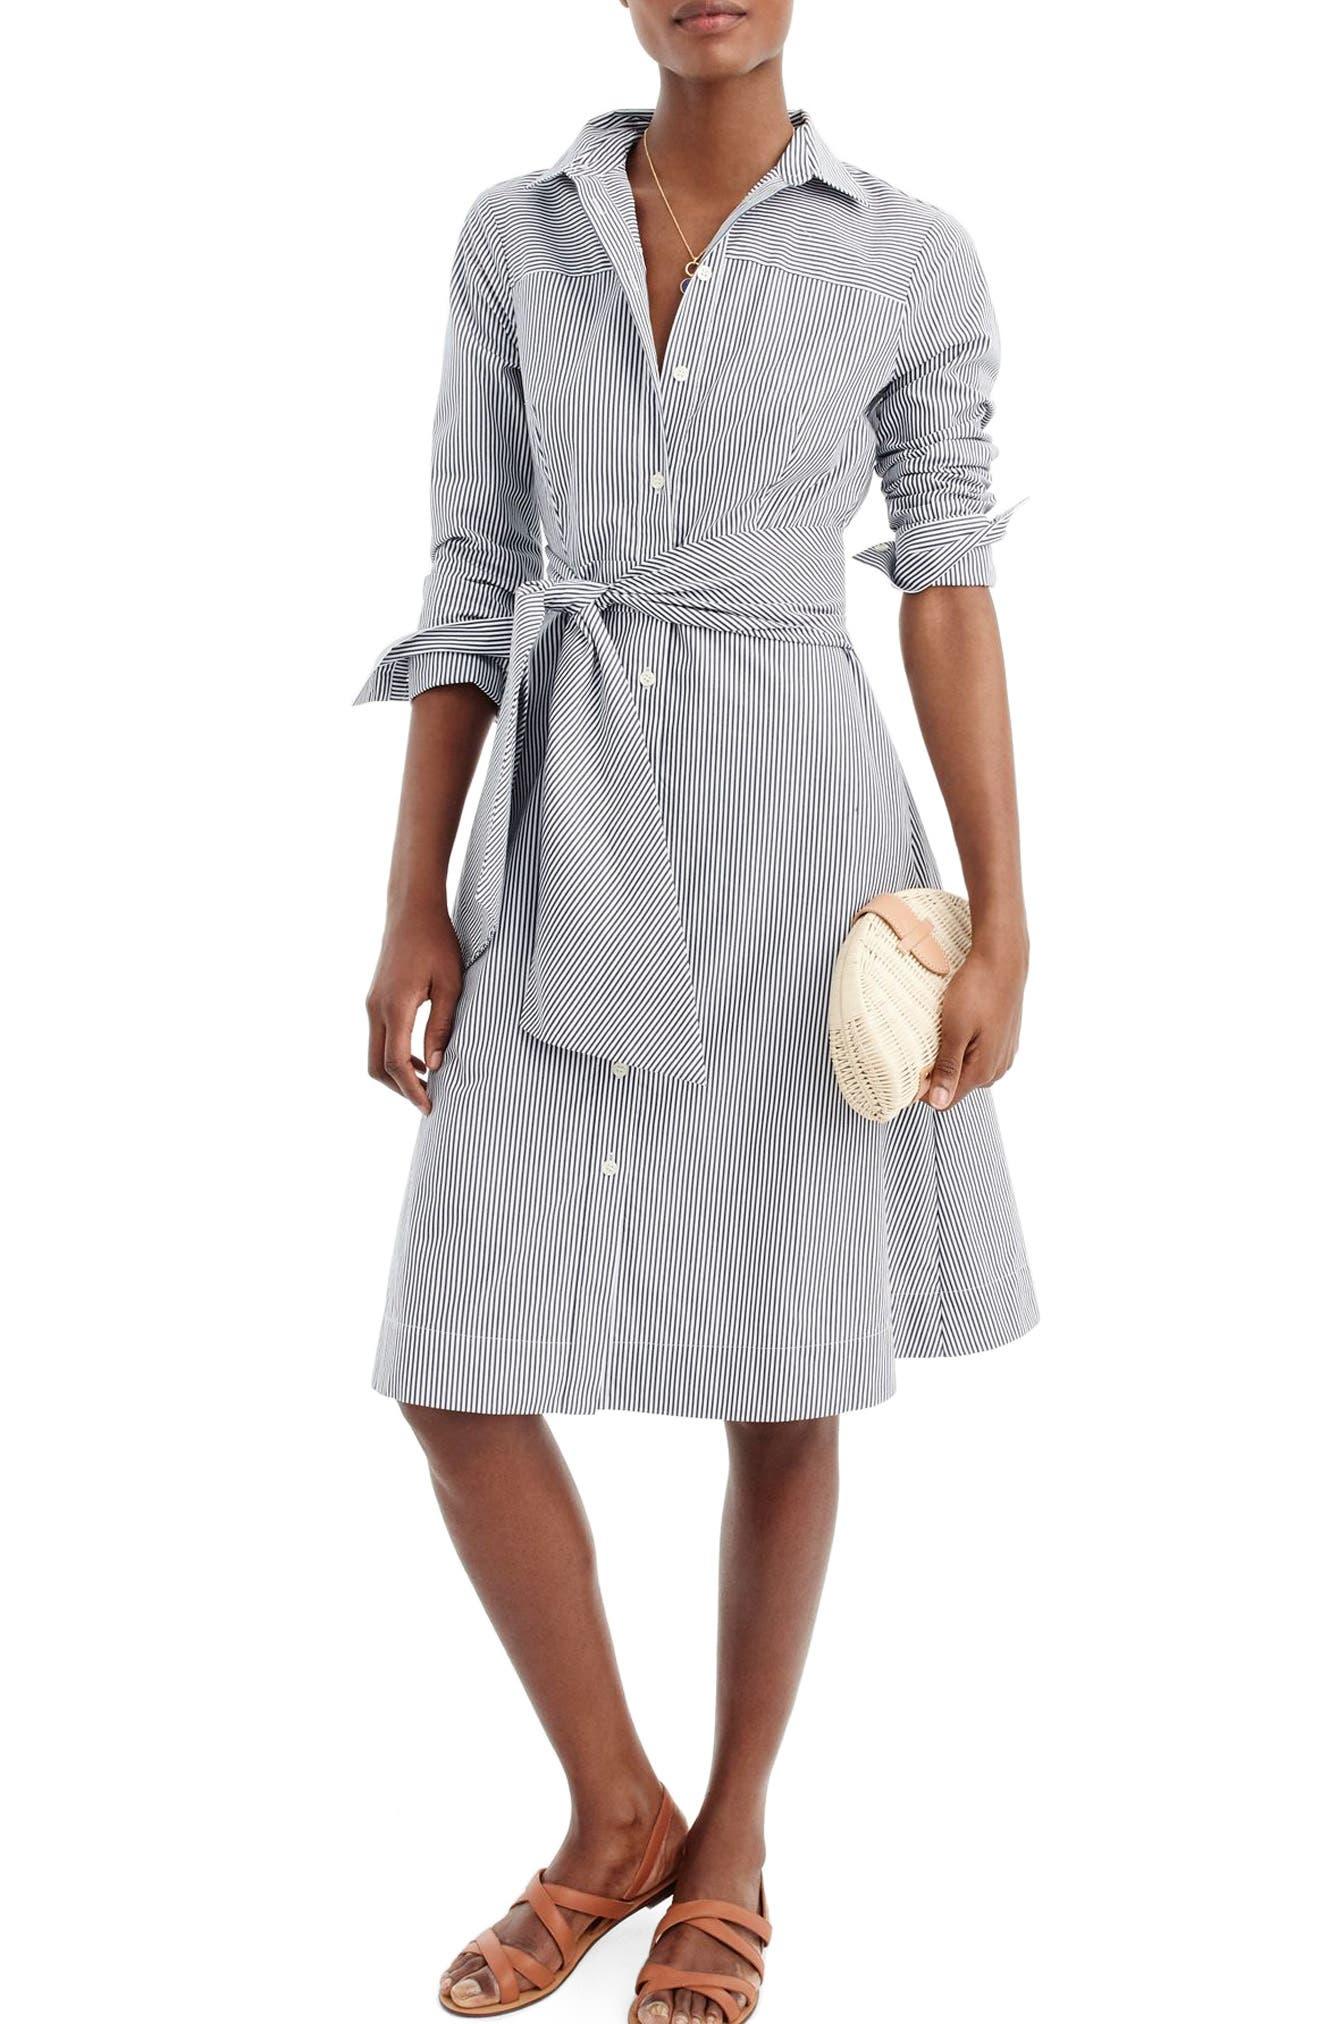 Alternate Image 1 Selected - J.Crew Maribou Stripe Cotton Shirtdress (Regular & Petite)